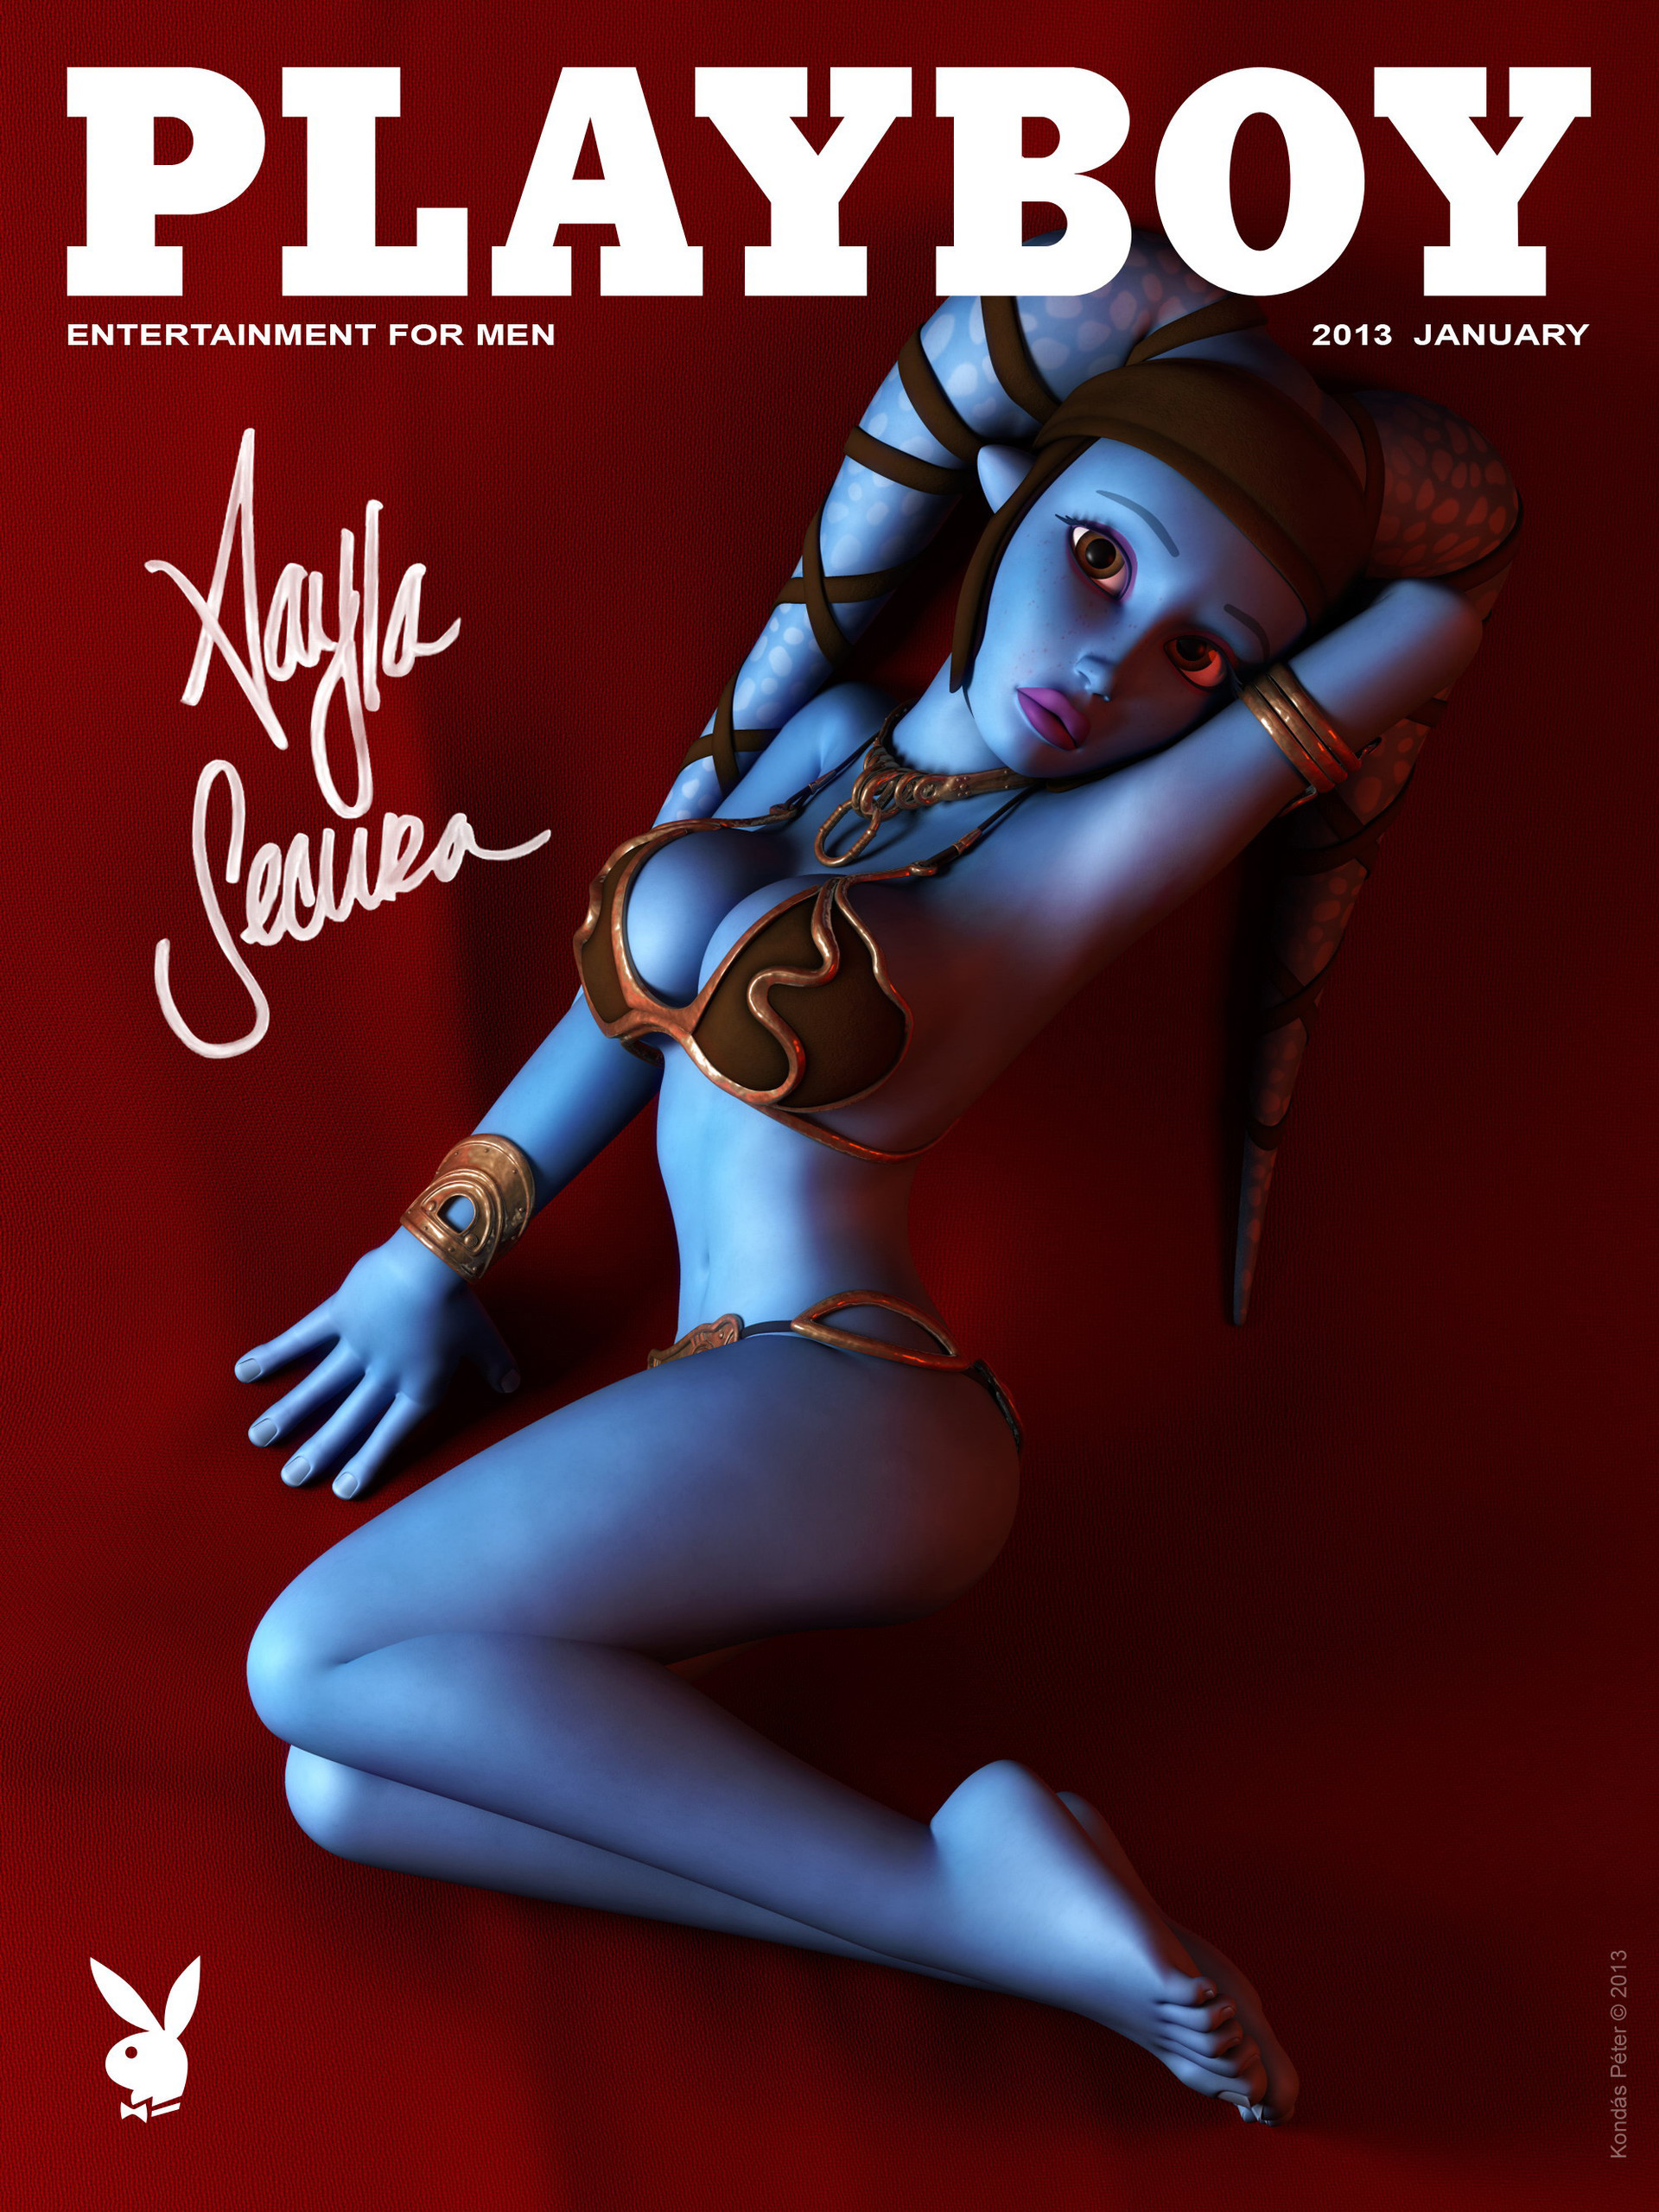 Star wars playboy hentai nude scene